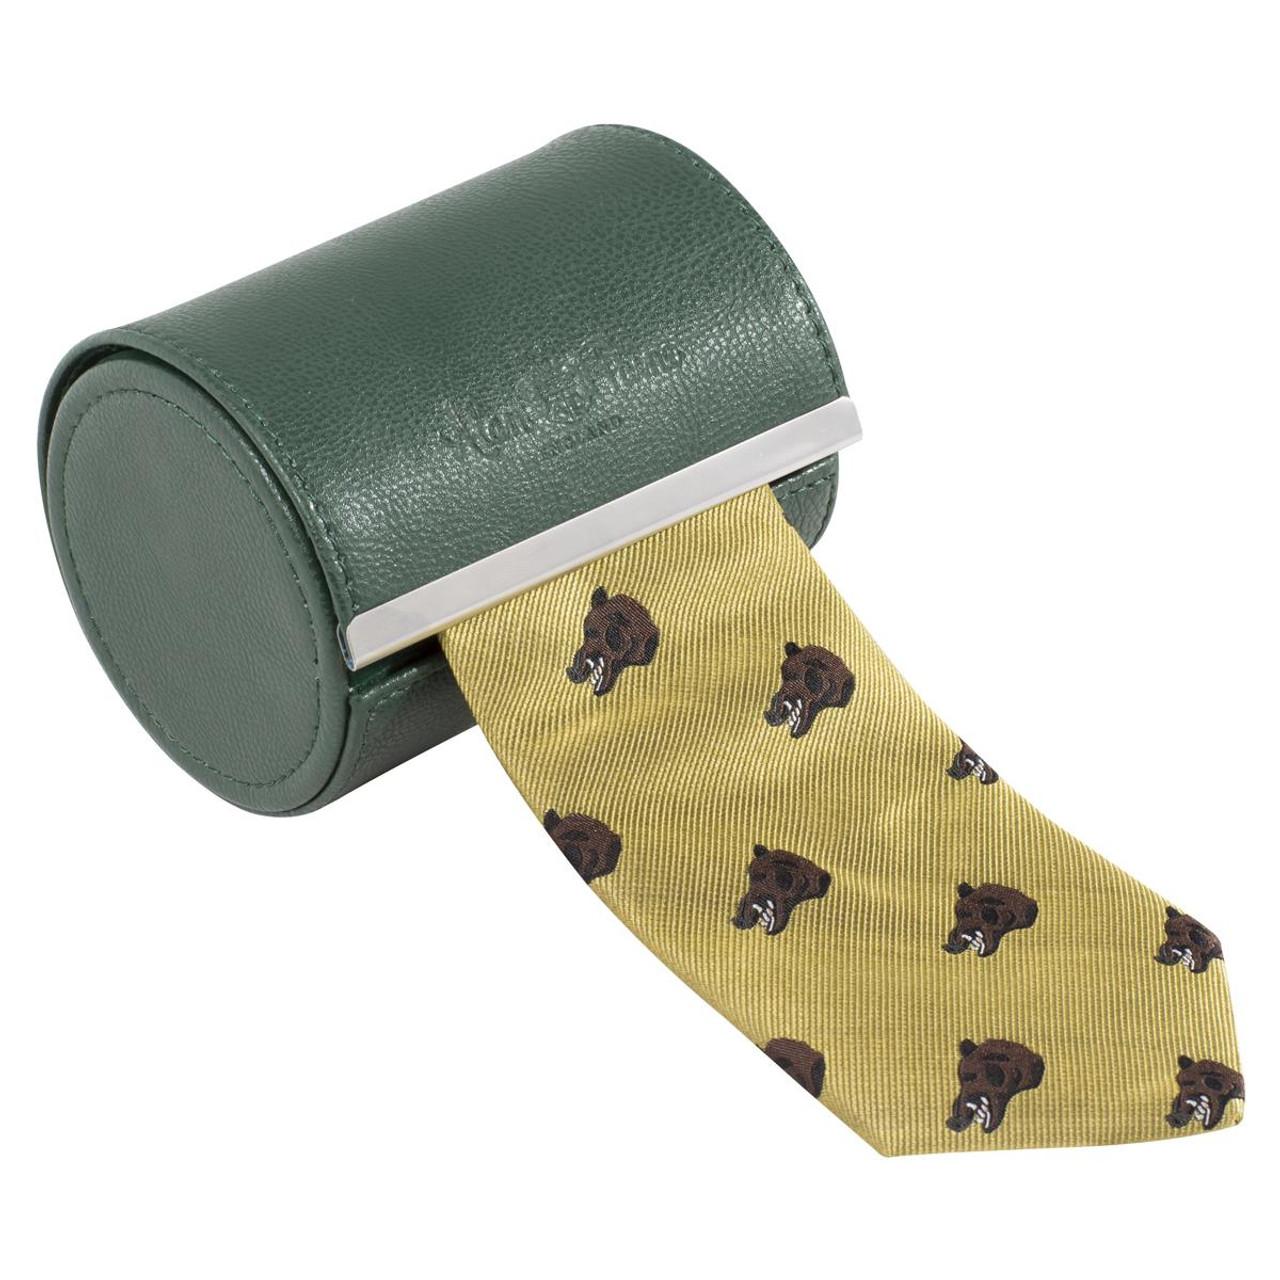 Wild Boar Gold Alan Paine Ripon Silk Tie